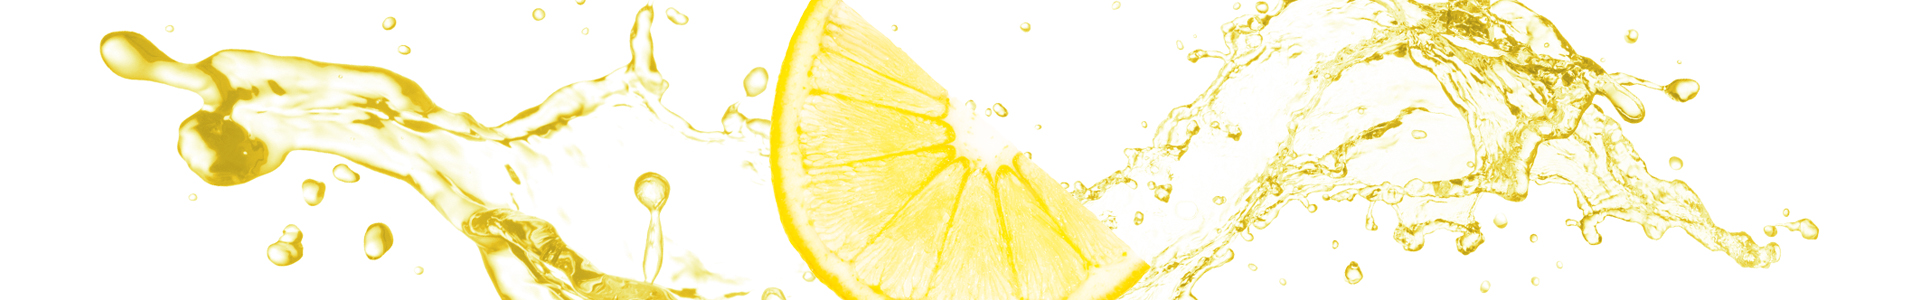 Maschera Olio Gel Viso - Detossinante Illuminante